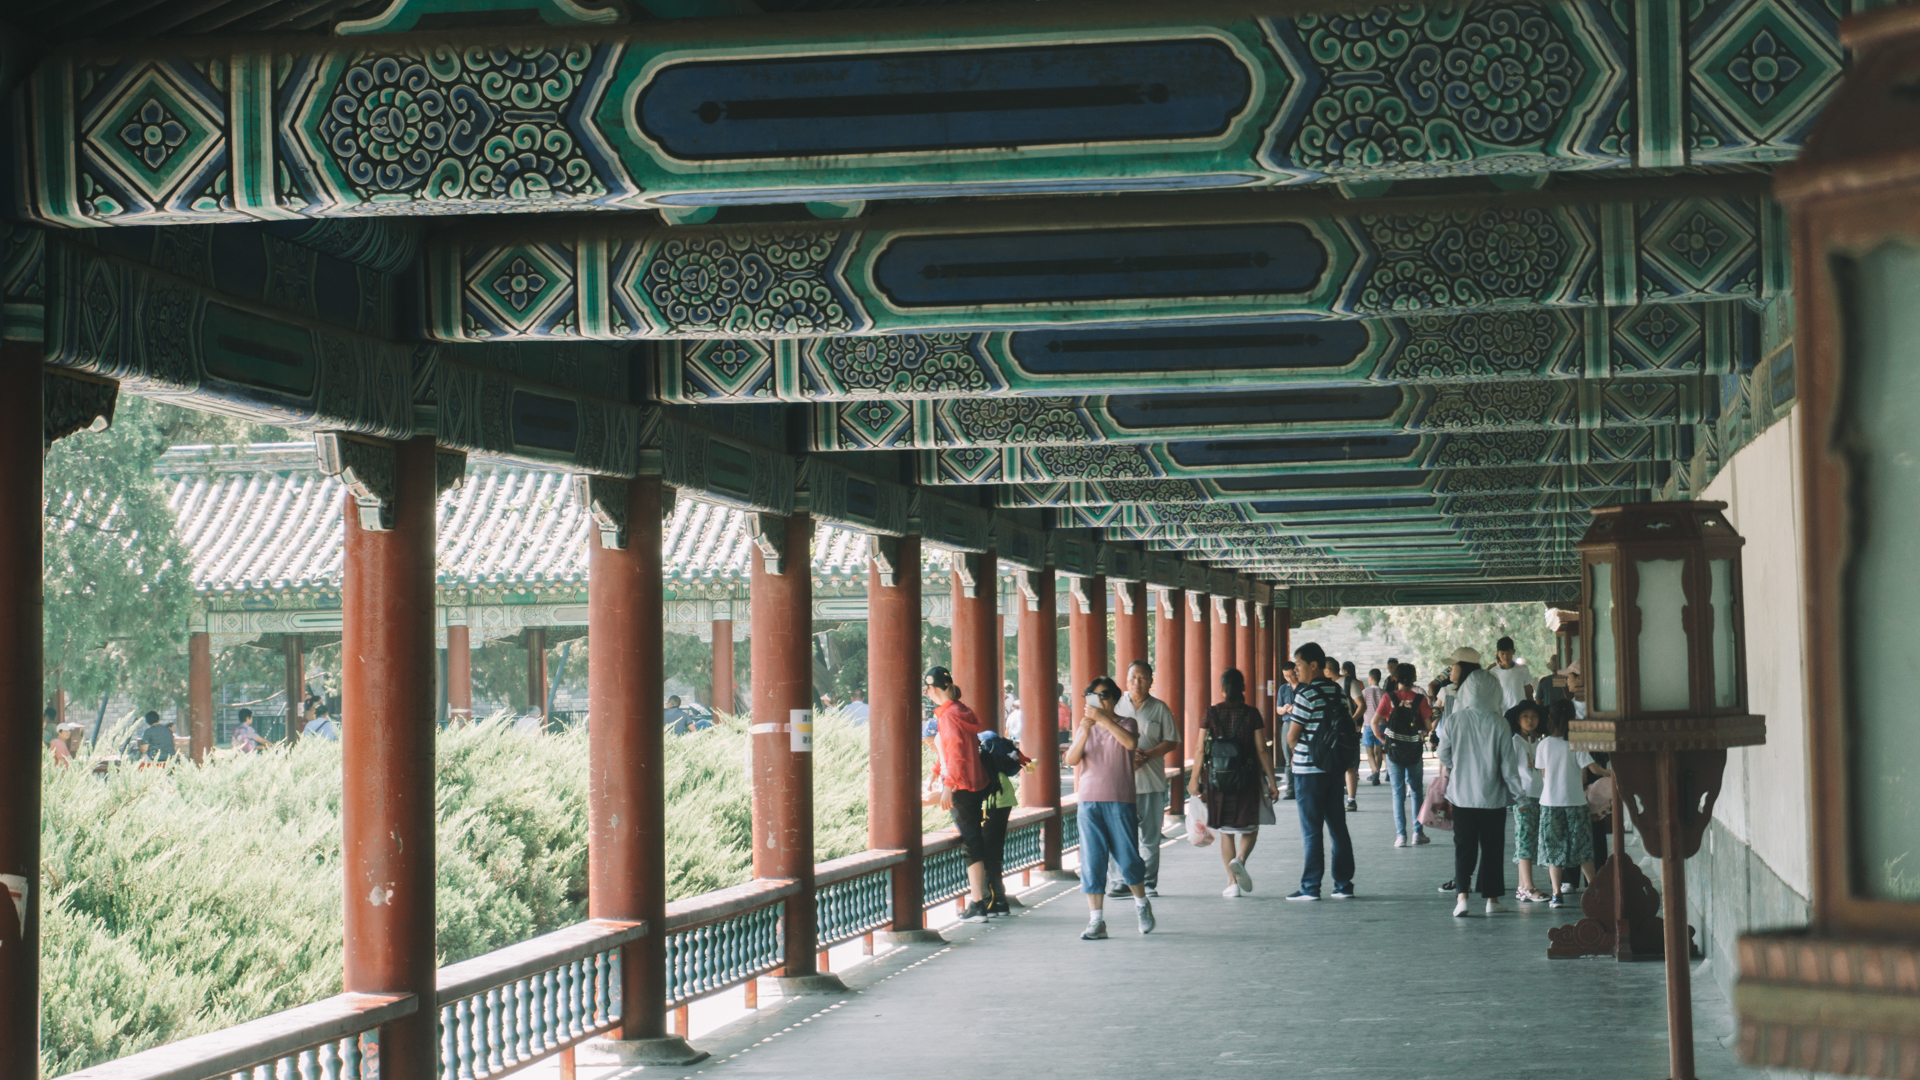 DSC00255_pechino_temple_heaven_cielo_travel_psych_chiara_china_cina